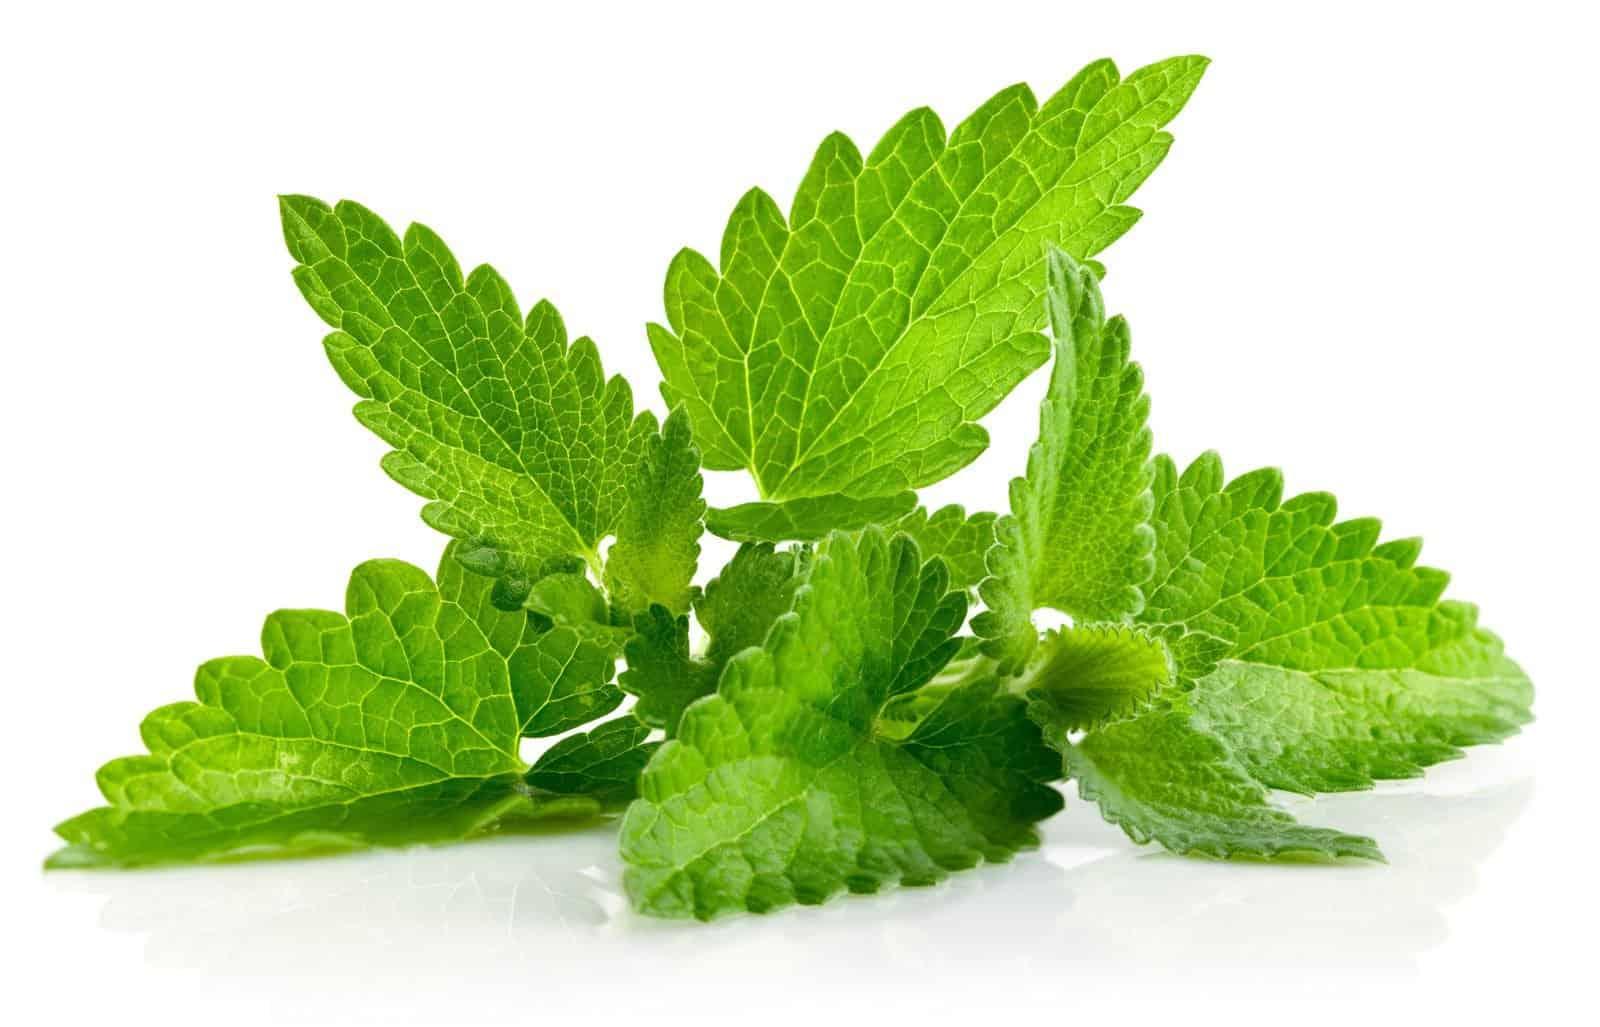 Herbs 9 - Ellia Natural Cosmetics - Cyprus Europe